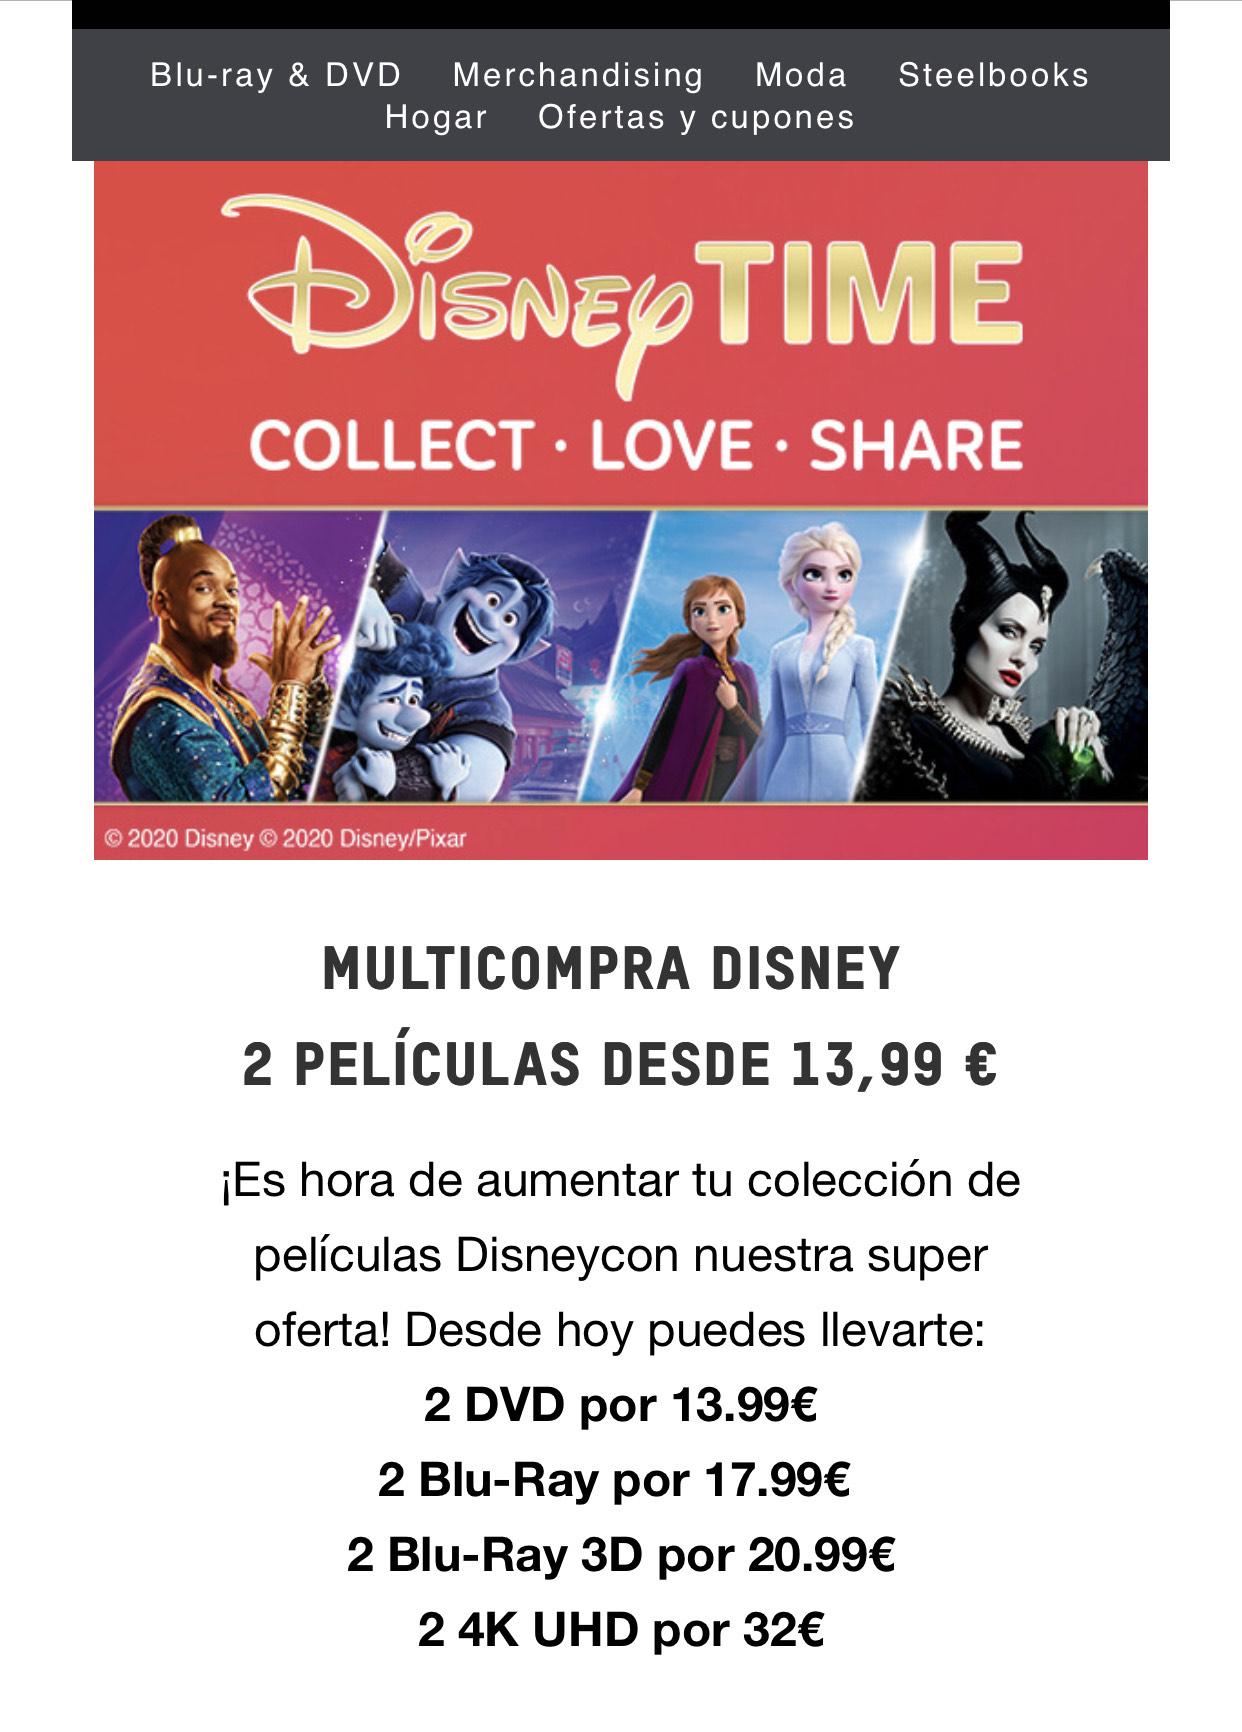 Pelis Disney 2x1